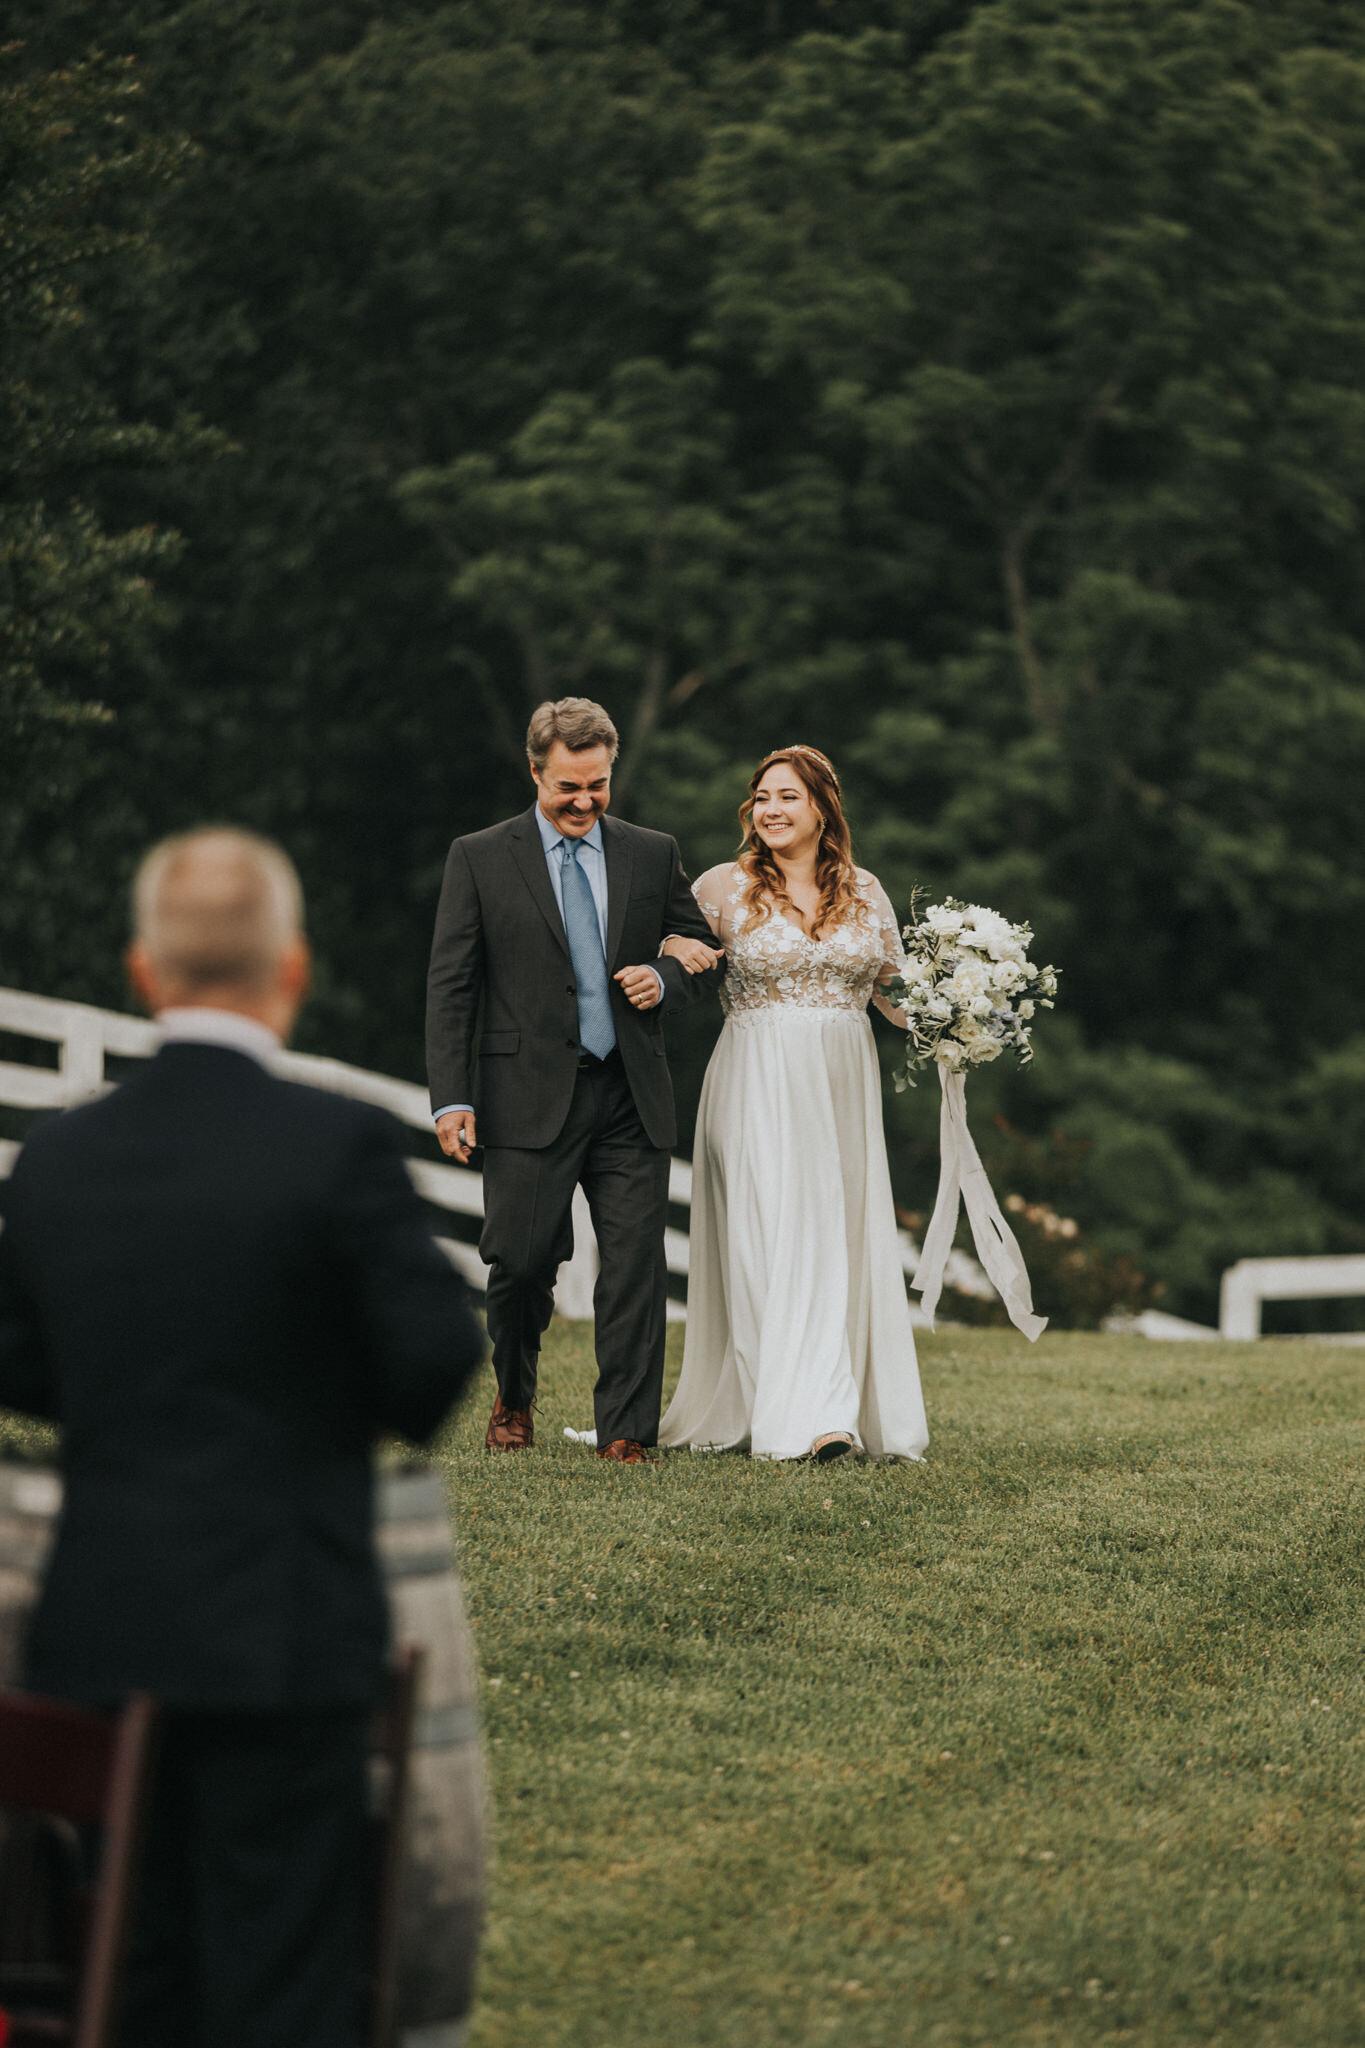 KateMatt-North-Georgia-Wedding-Photographer-Mountain-Laurel-Farm-97.jpg